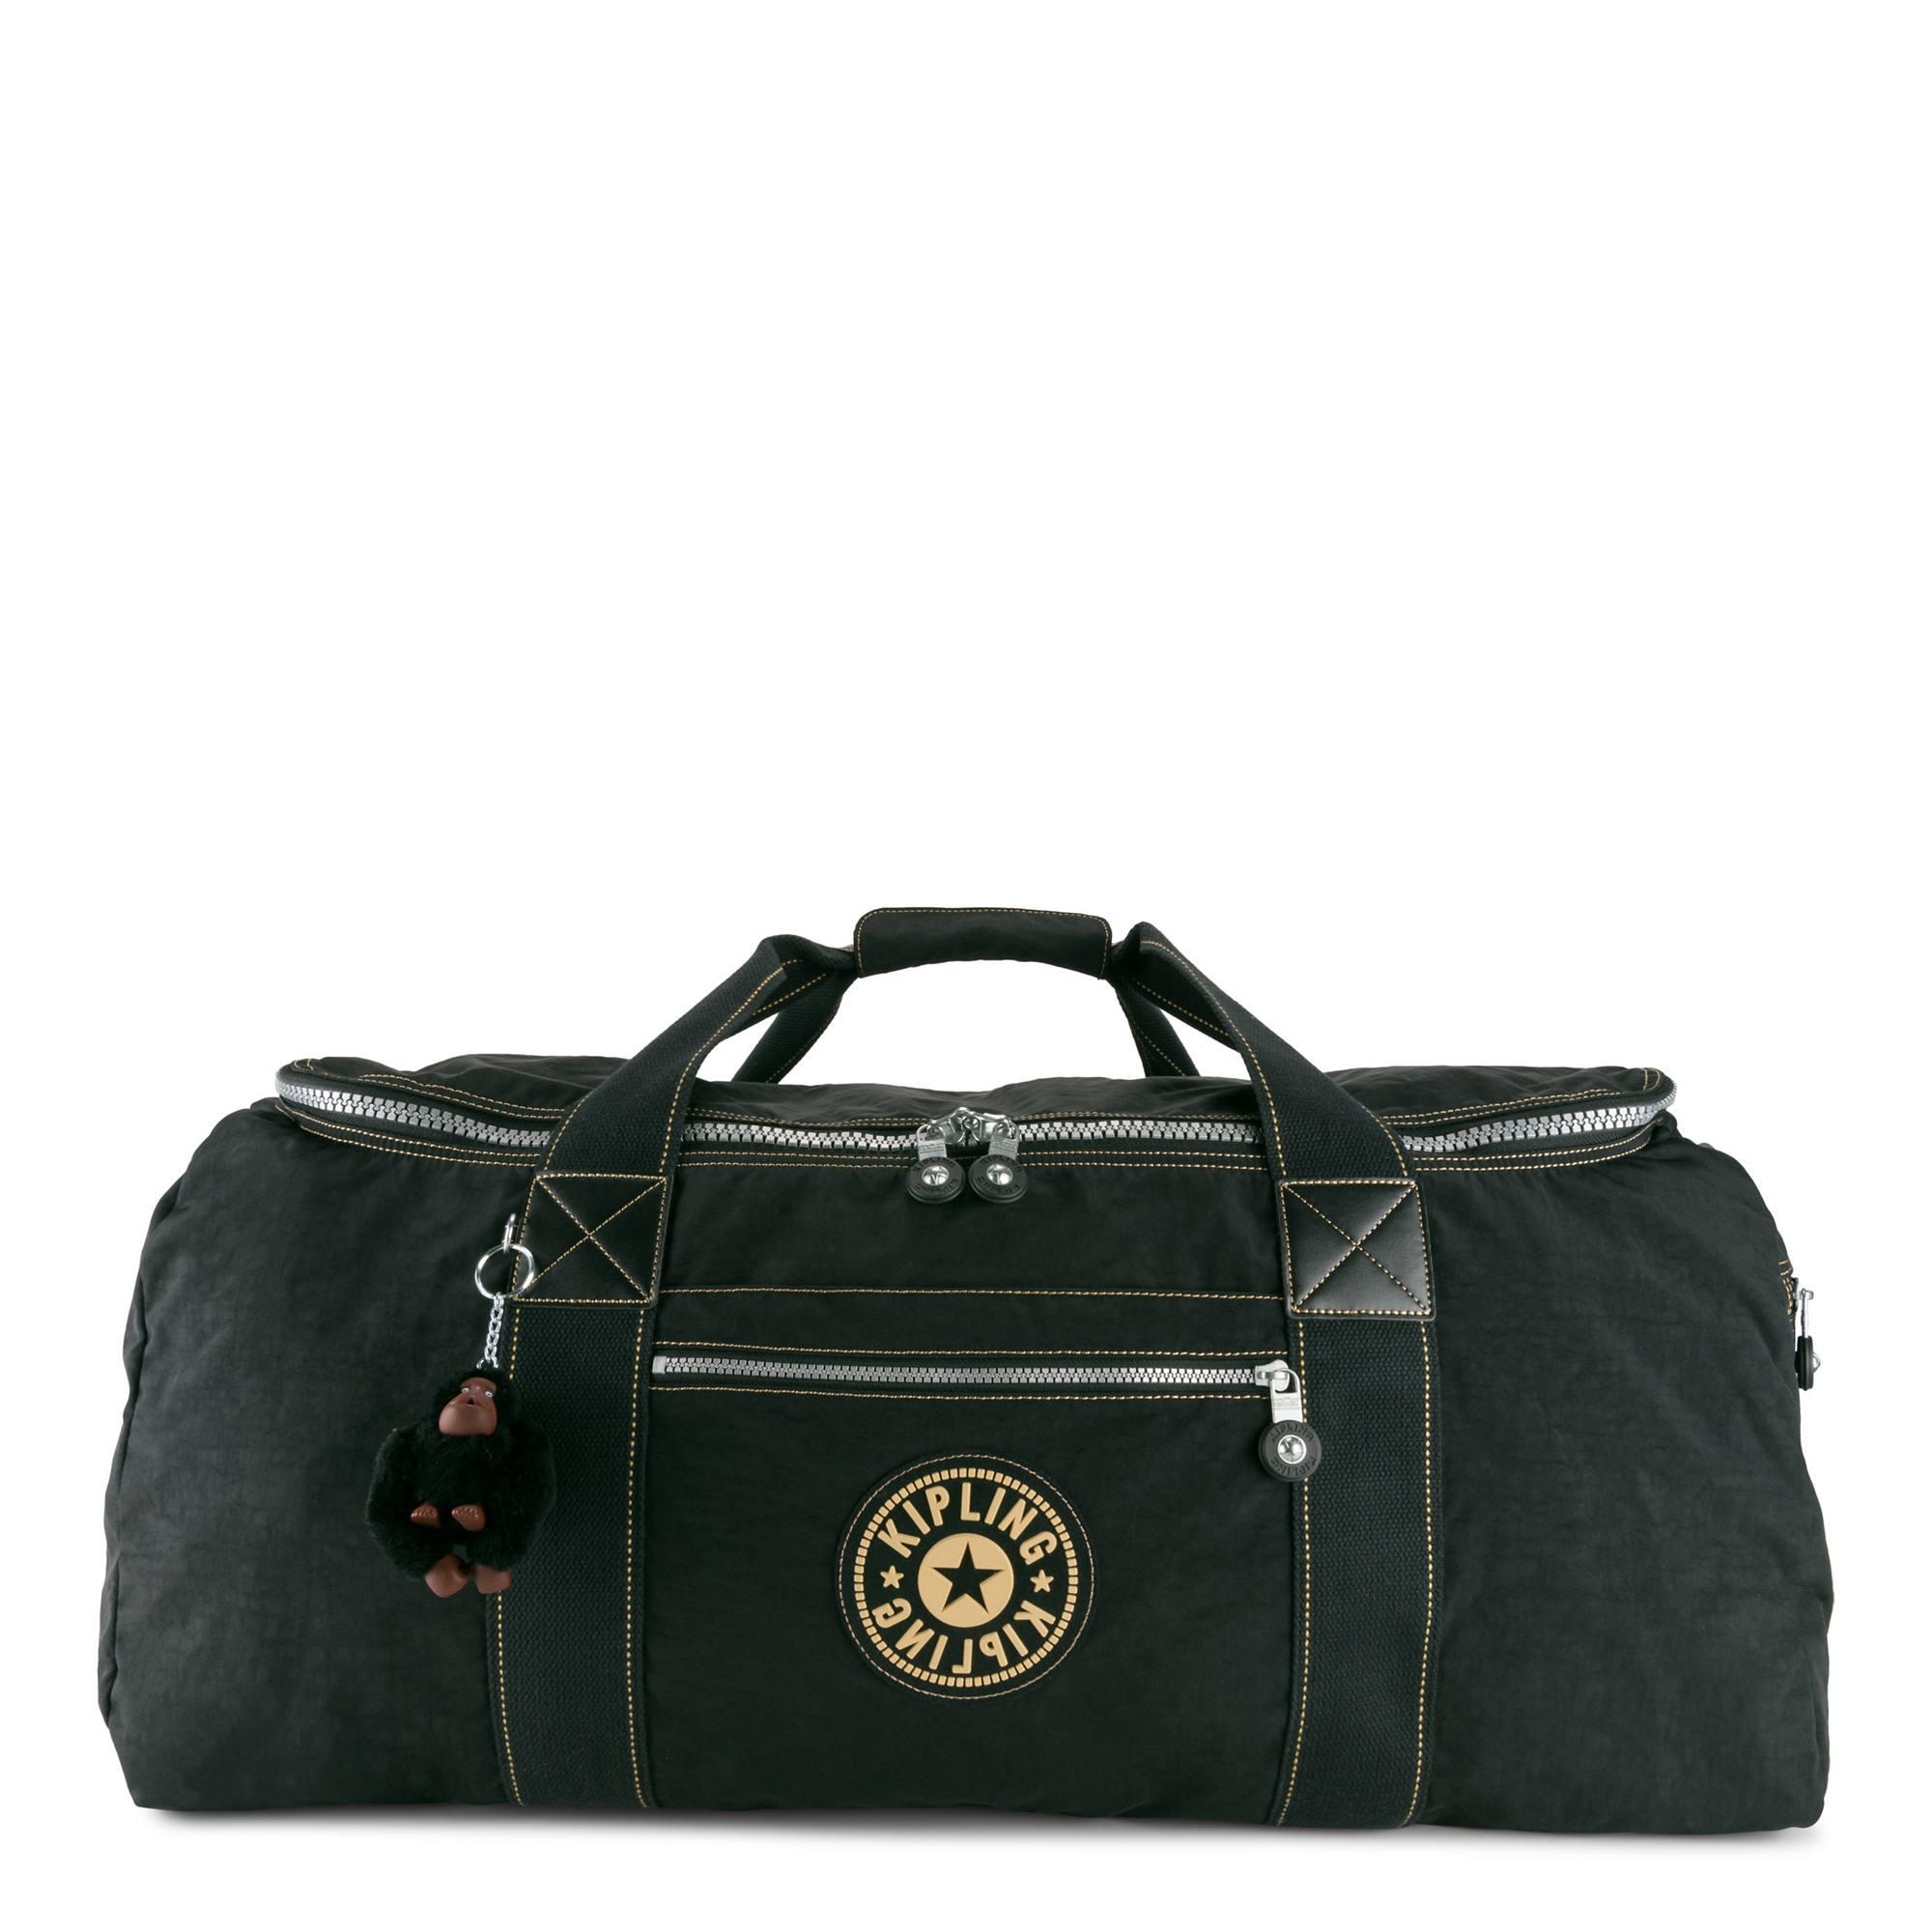 Duffle Bags | Sacs Polochon | Kipling FR